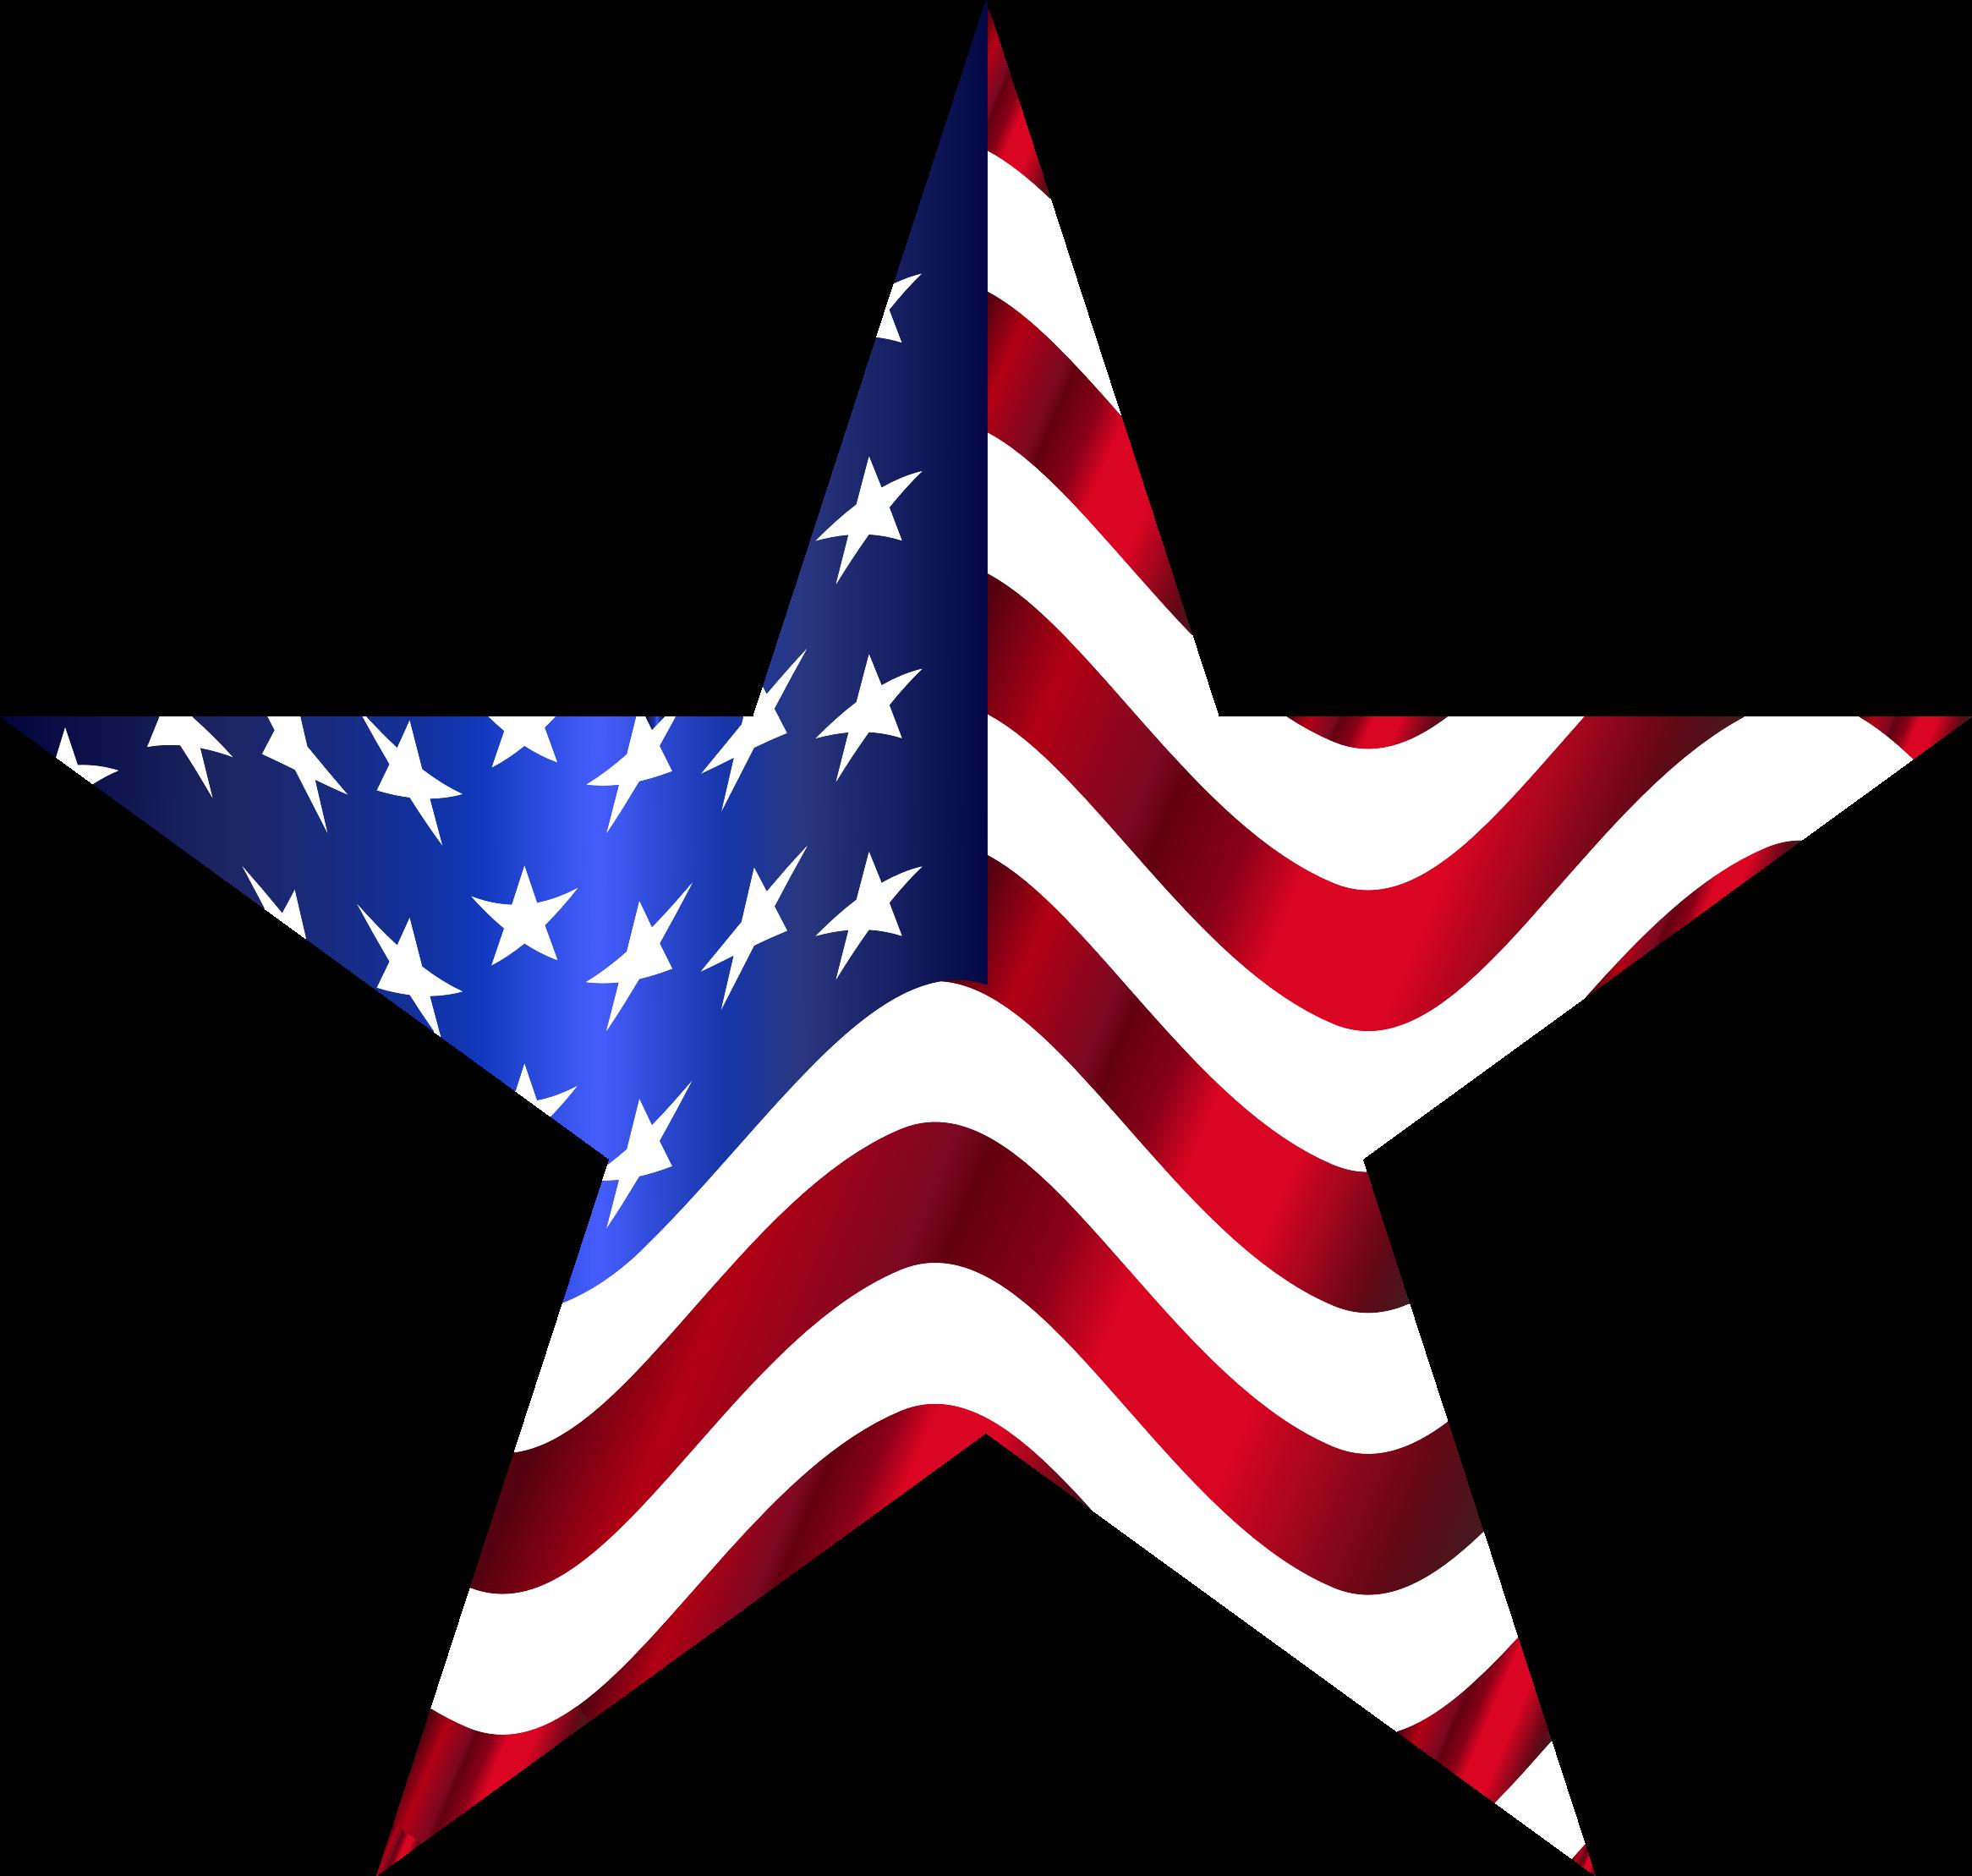 clipart transparent download United States of America Flag PNG Transparent Images